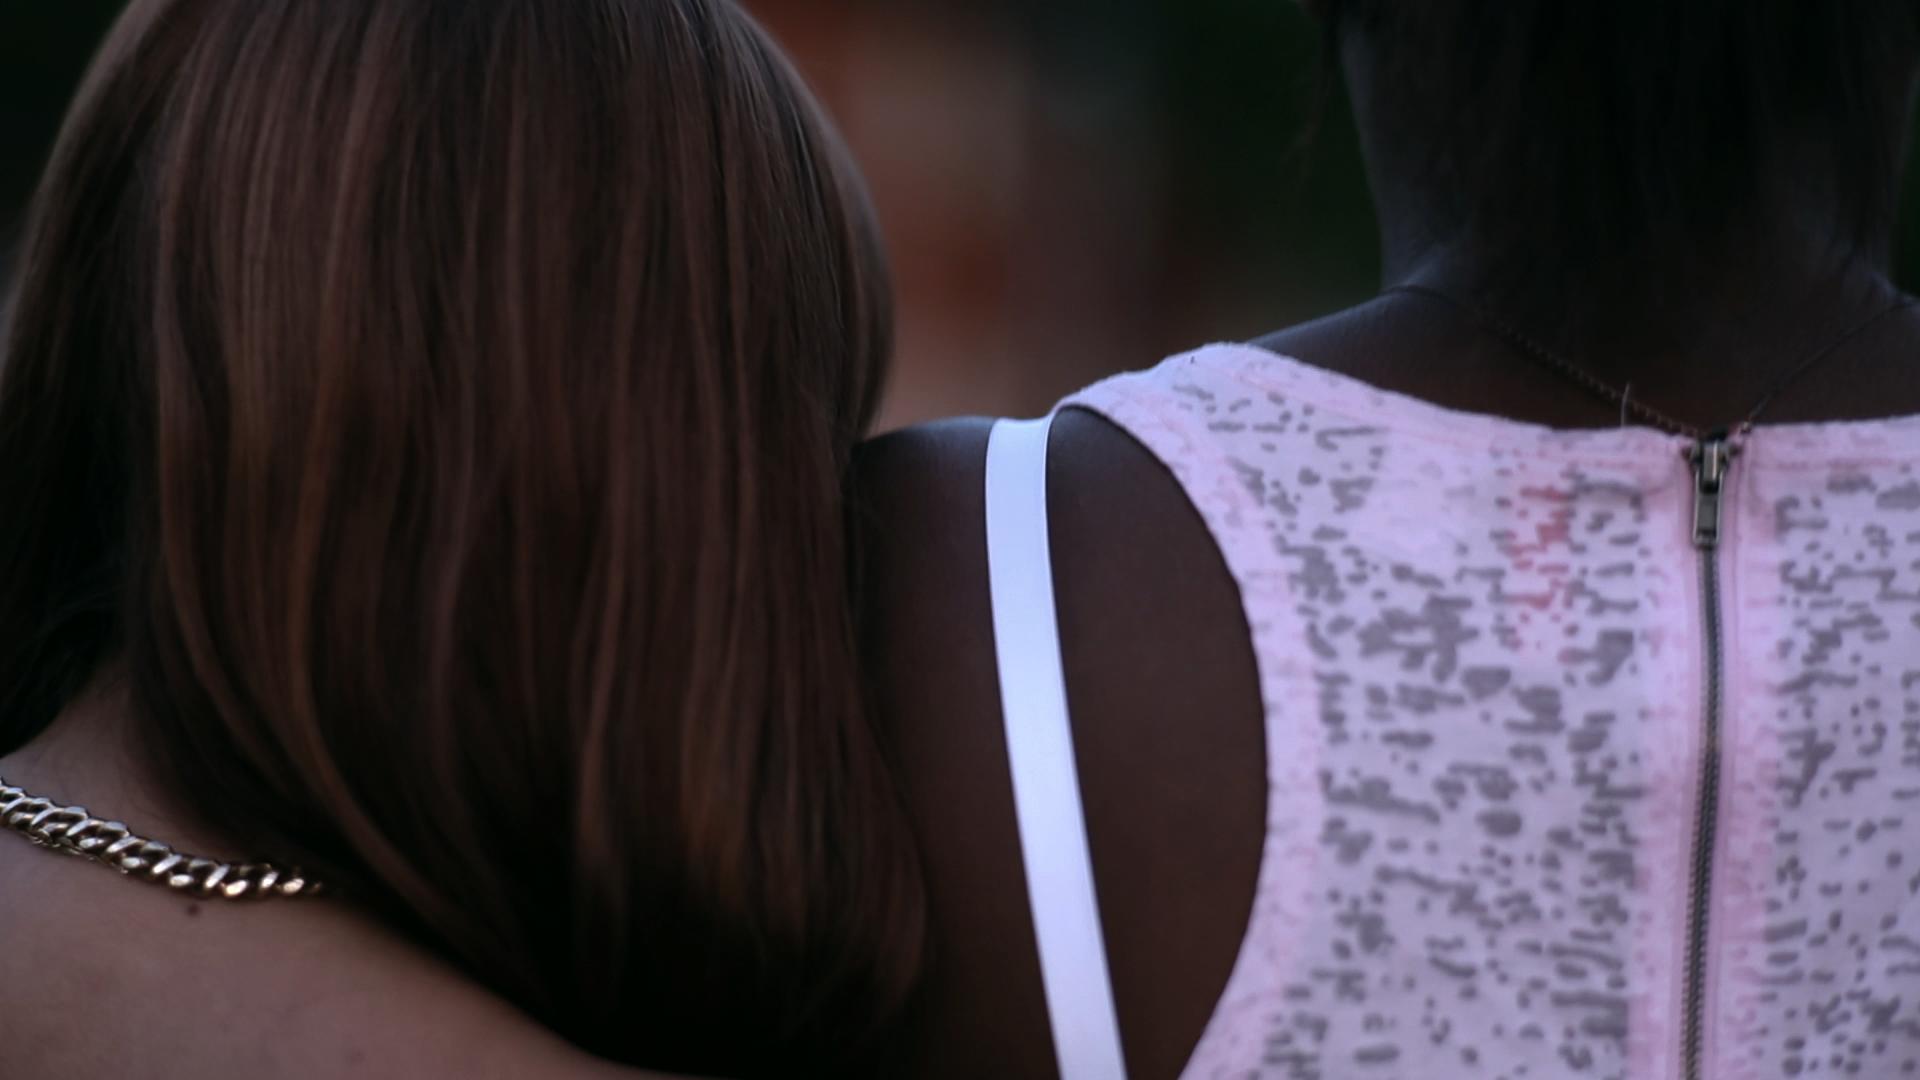 Schultersieg 5 - Michelle friendship - © AWFP Julia Lemke.jpg